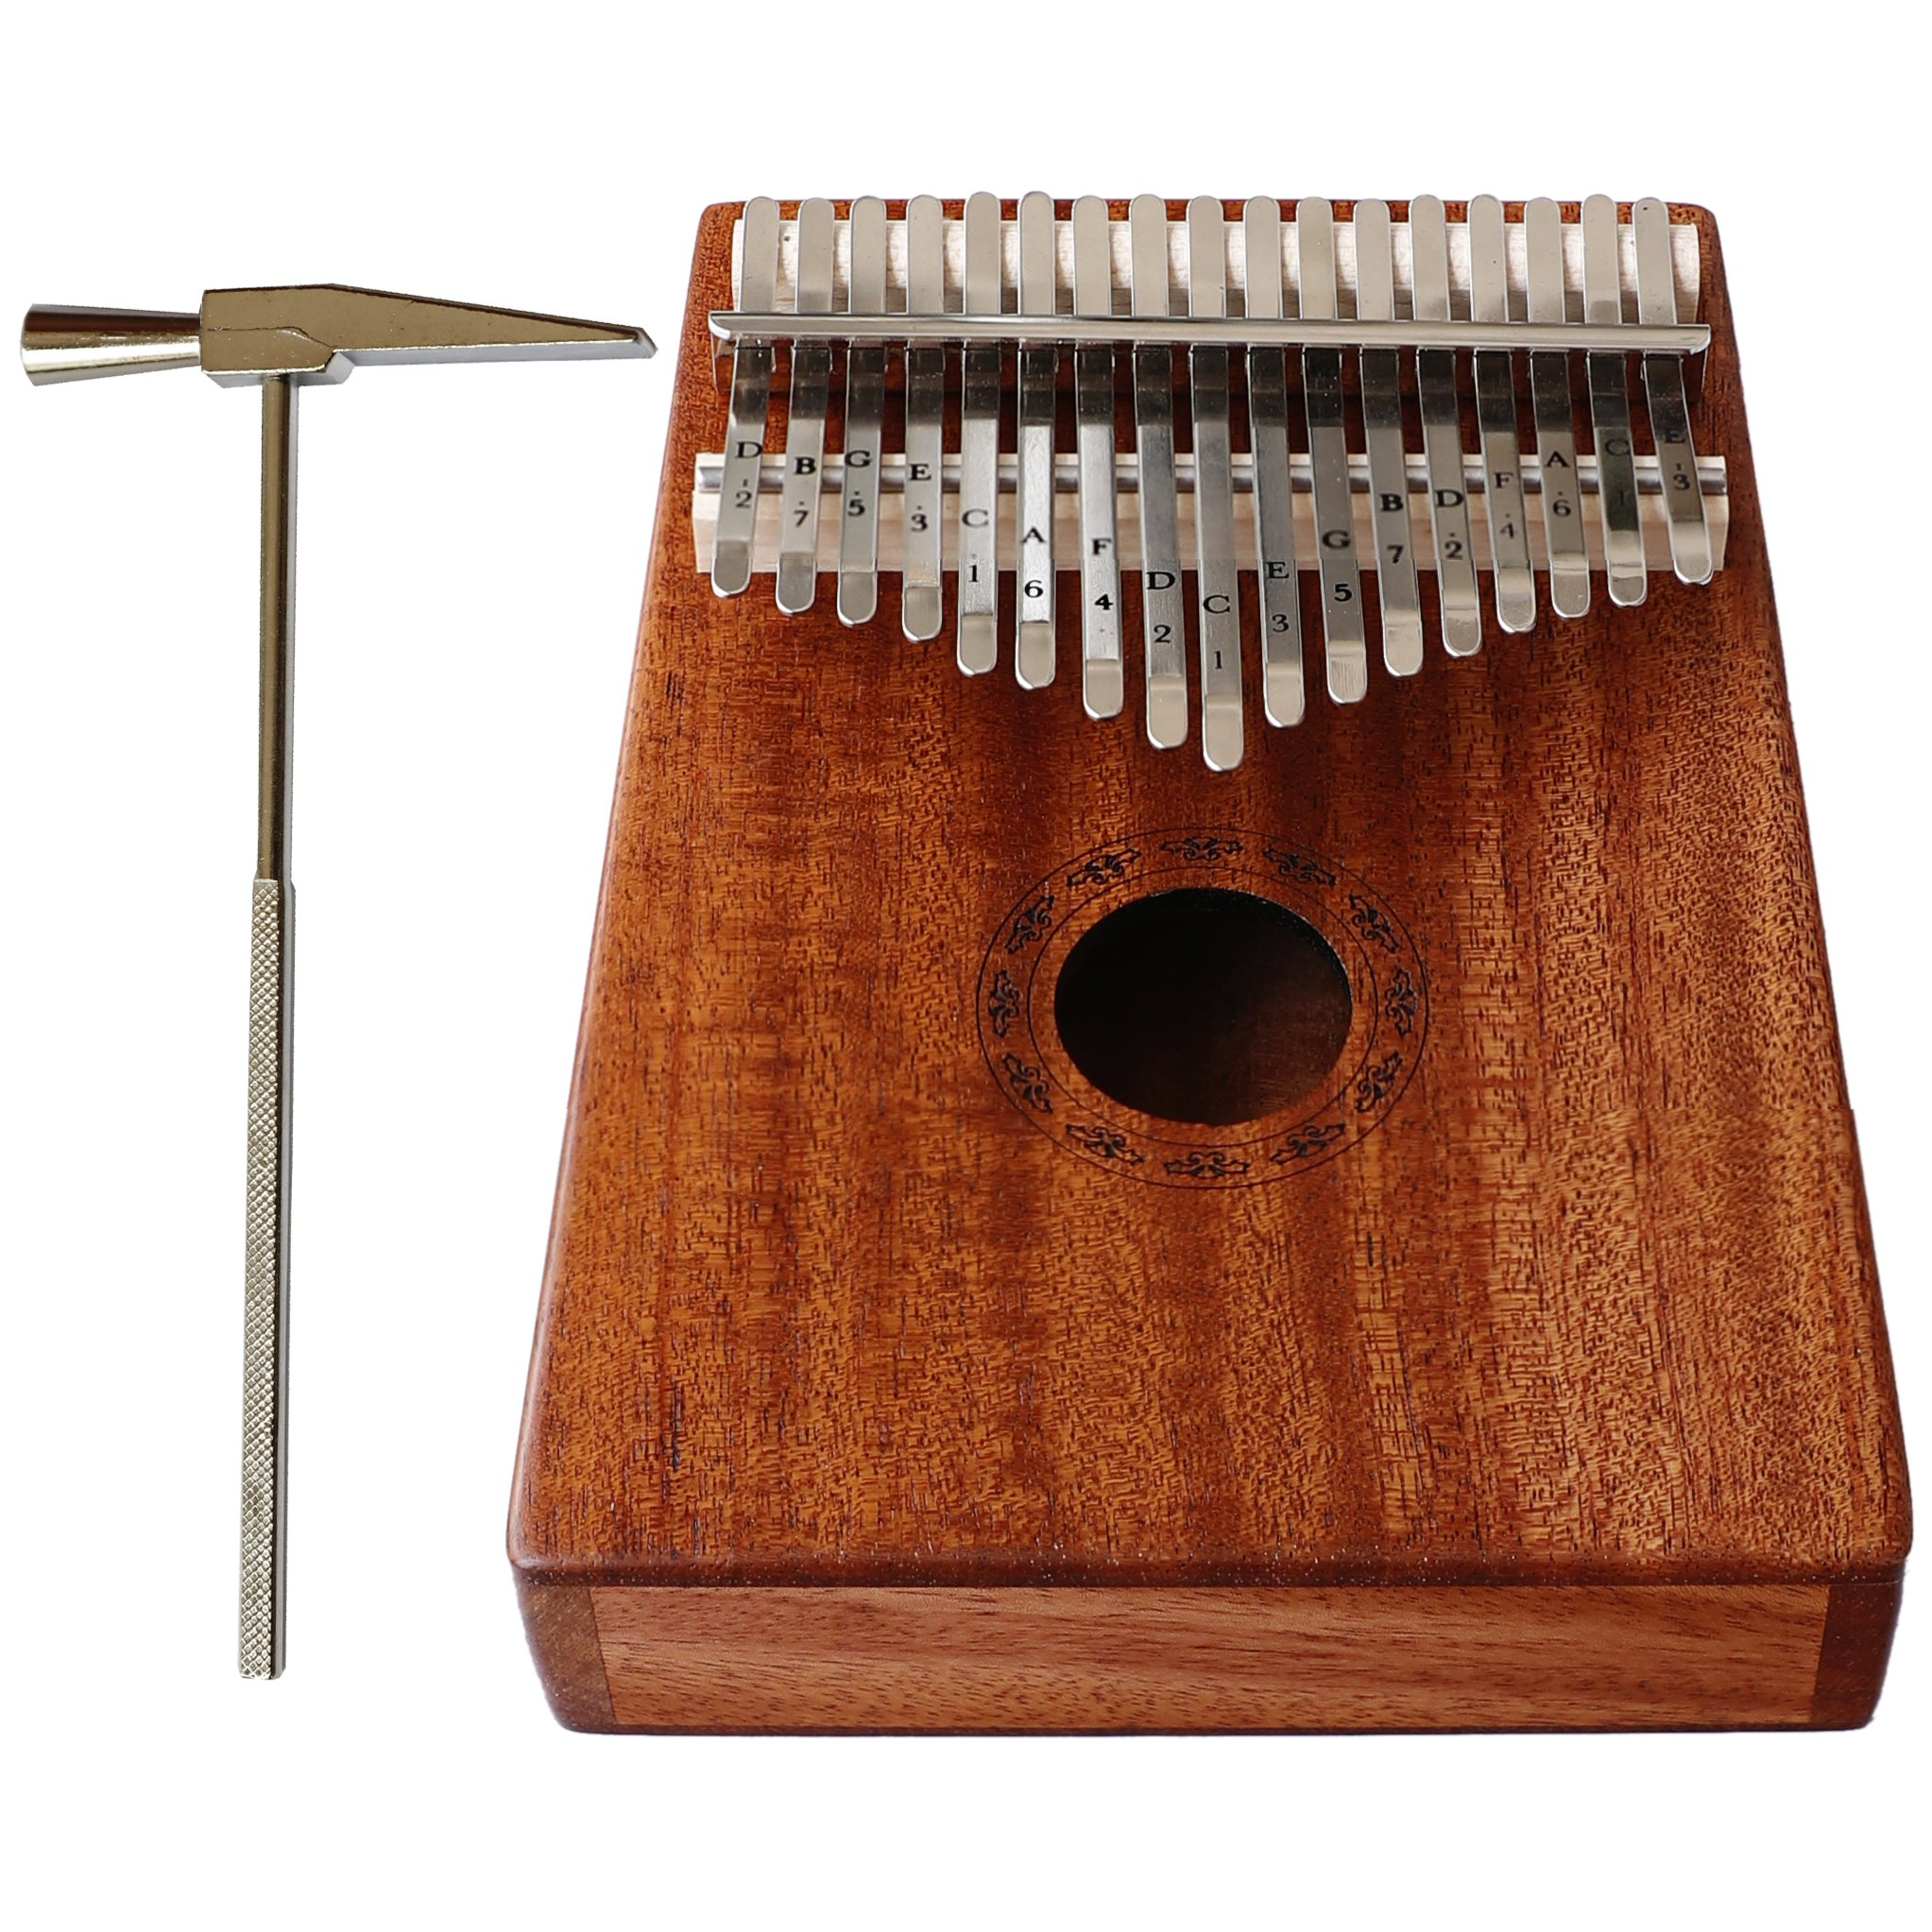 Jaymz Kalimba Mbira with 17 keys thumb piano - whole SOLID MAHOGANY in matte color with natural grain